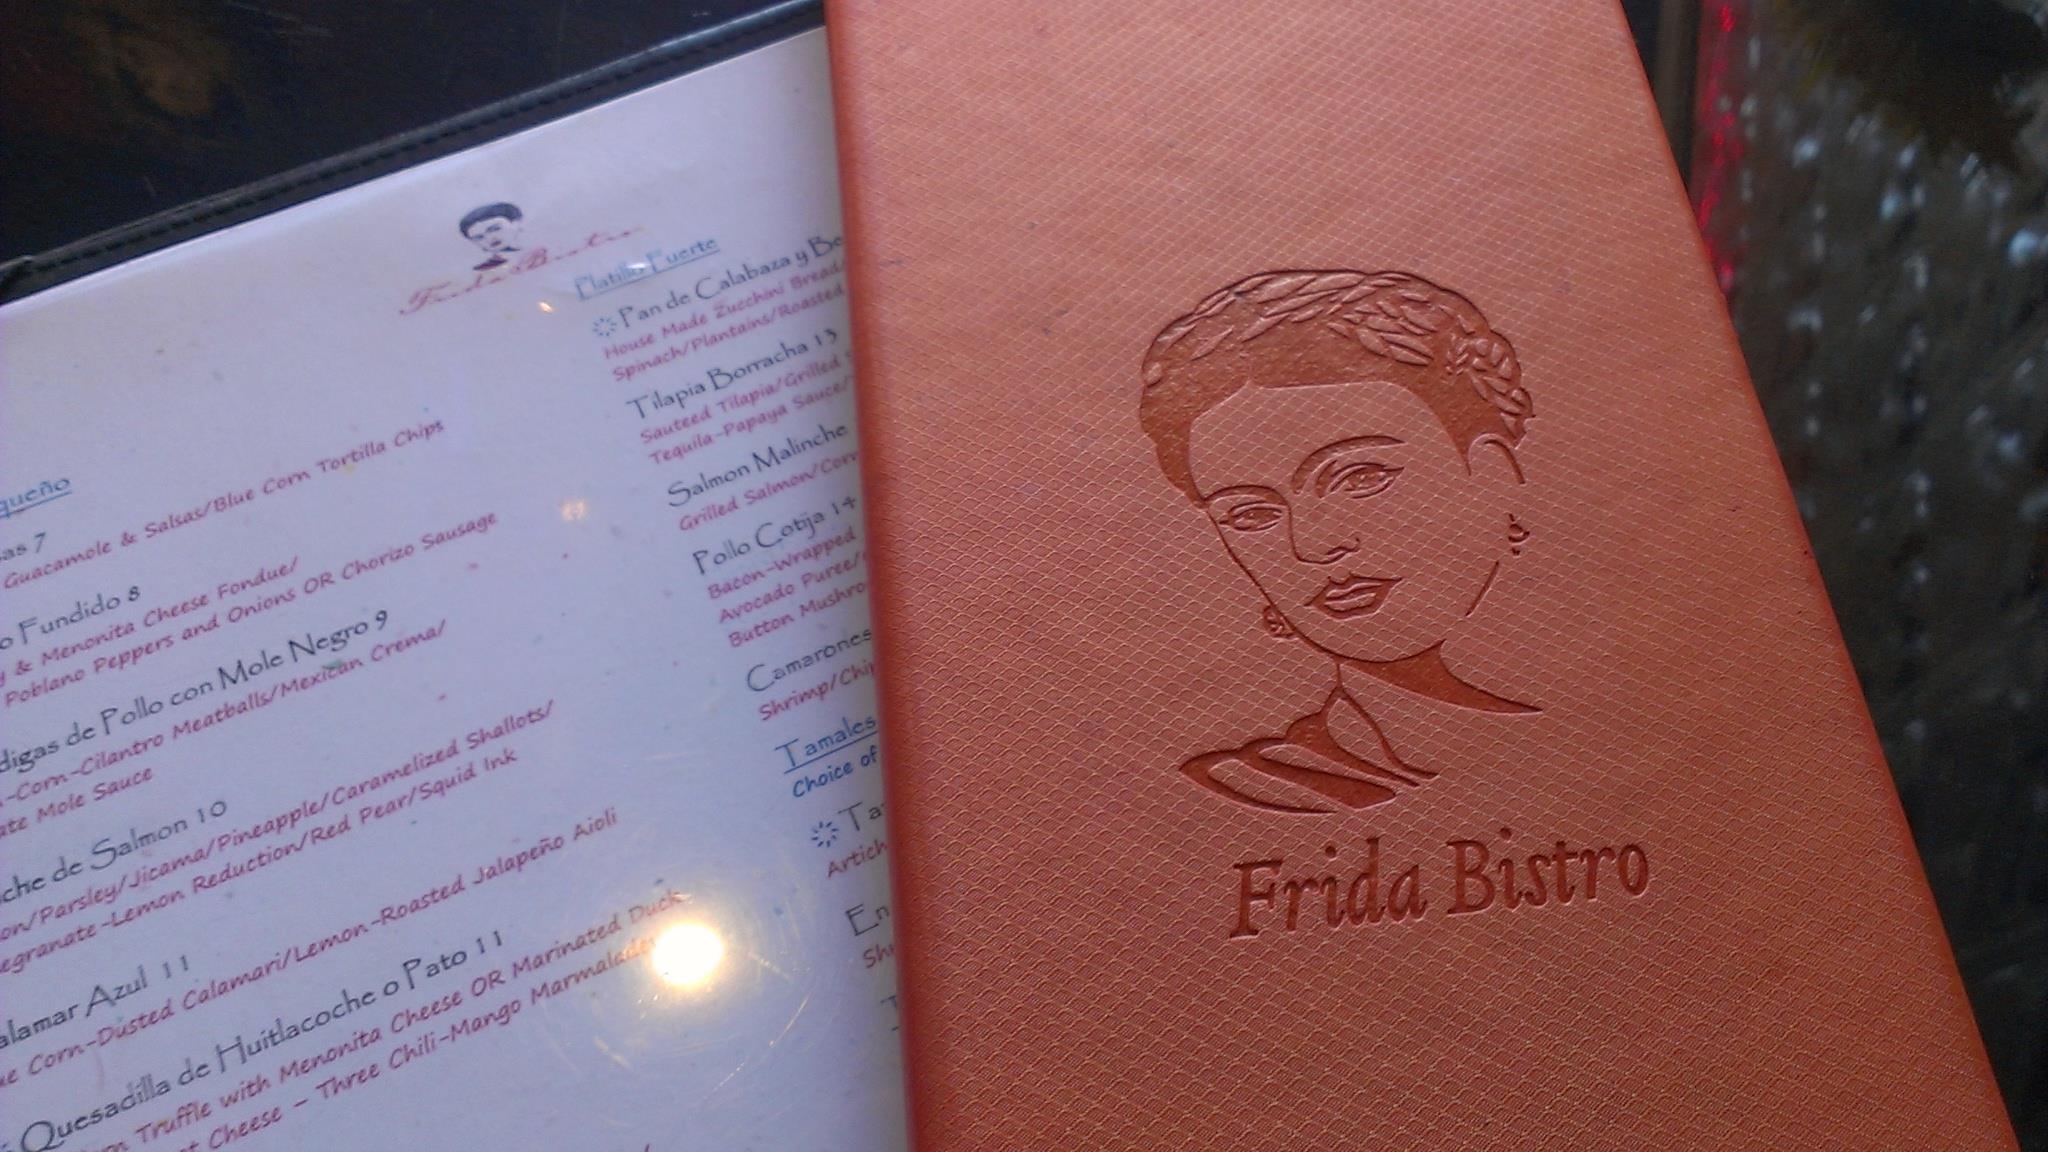 Frida Bistro